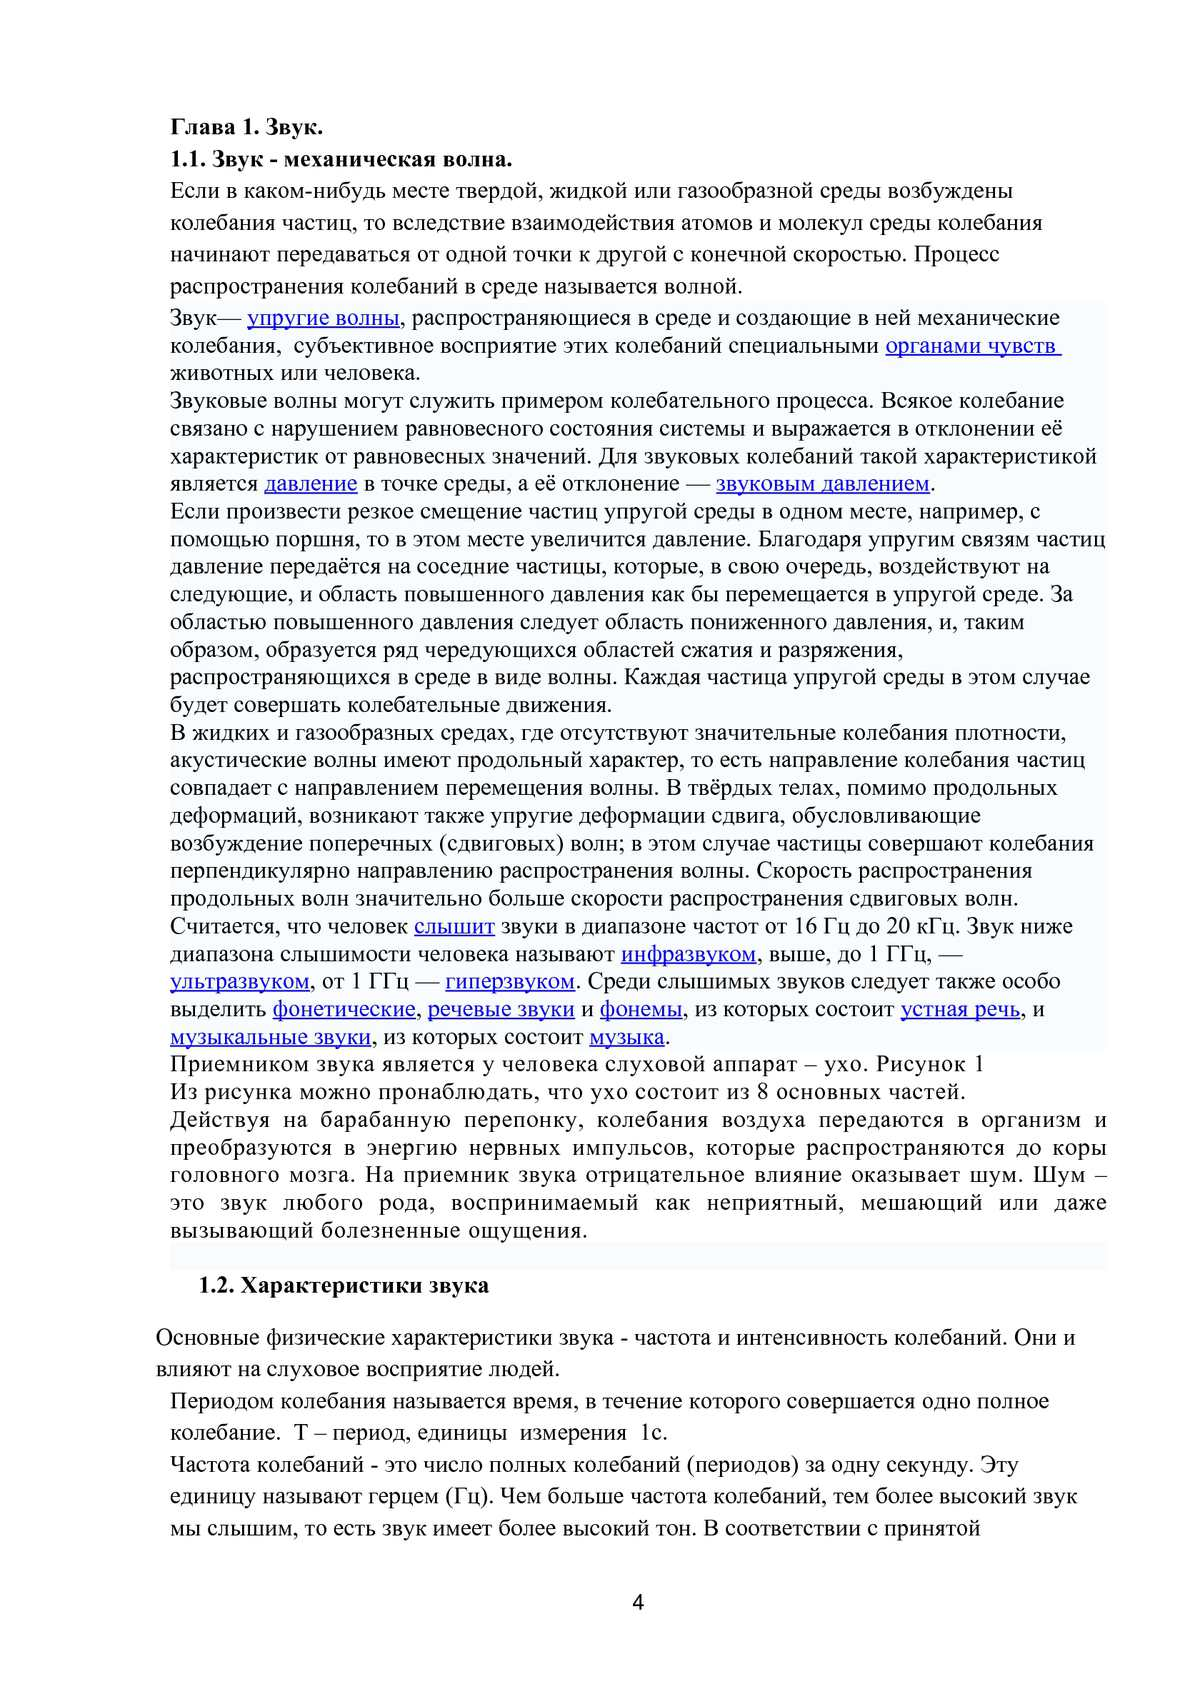 Реферат Звук и его влияние на человека calameo er page 4